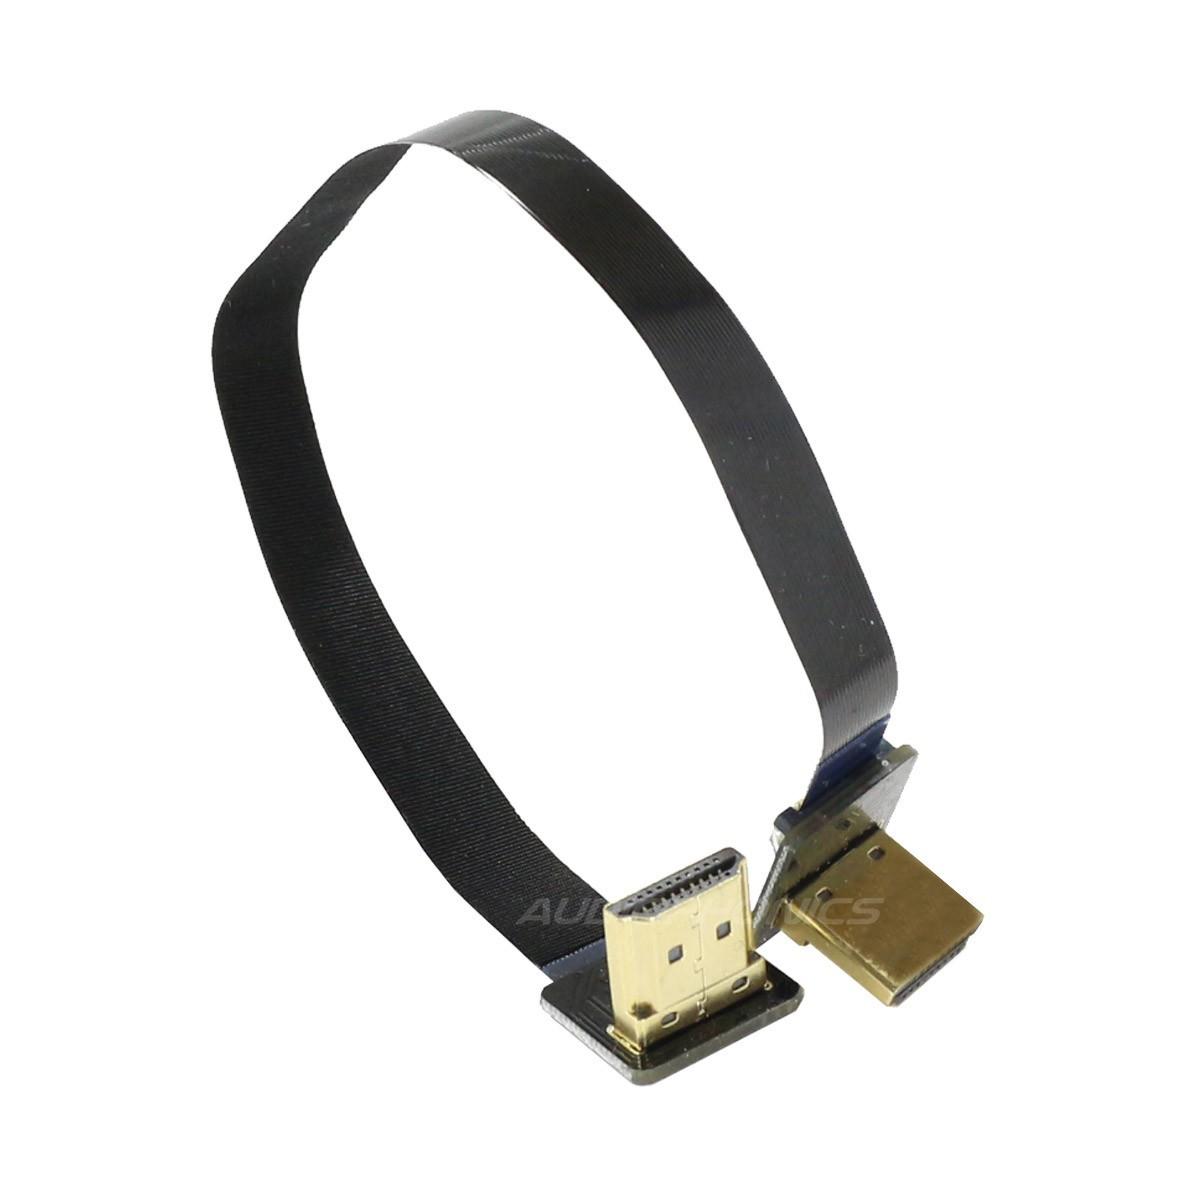 HDMI-A Ribbon cable Male / Male Angled 90° 20cm